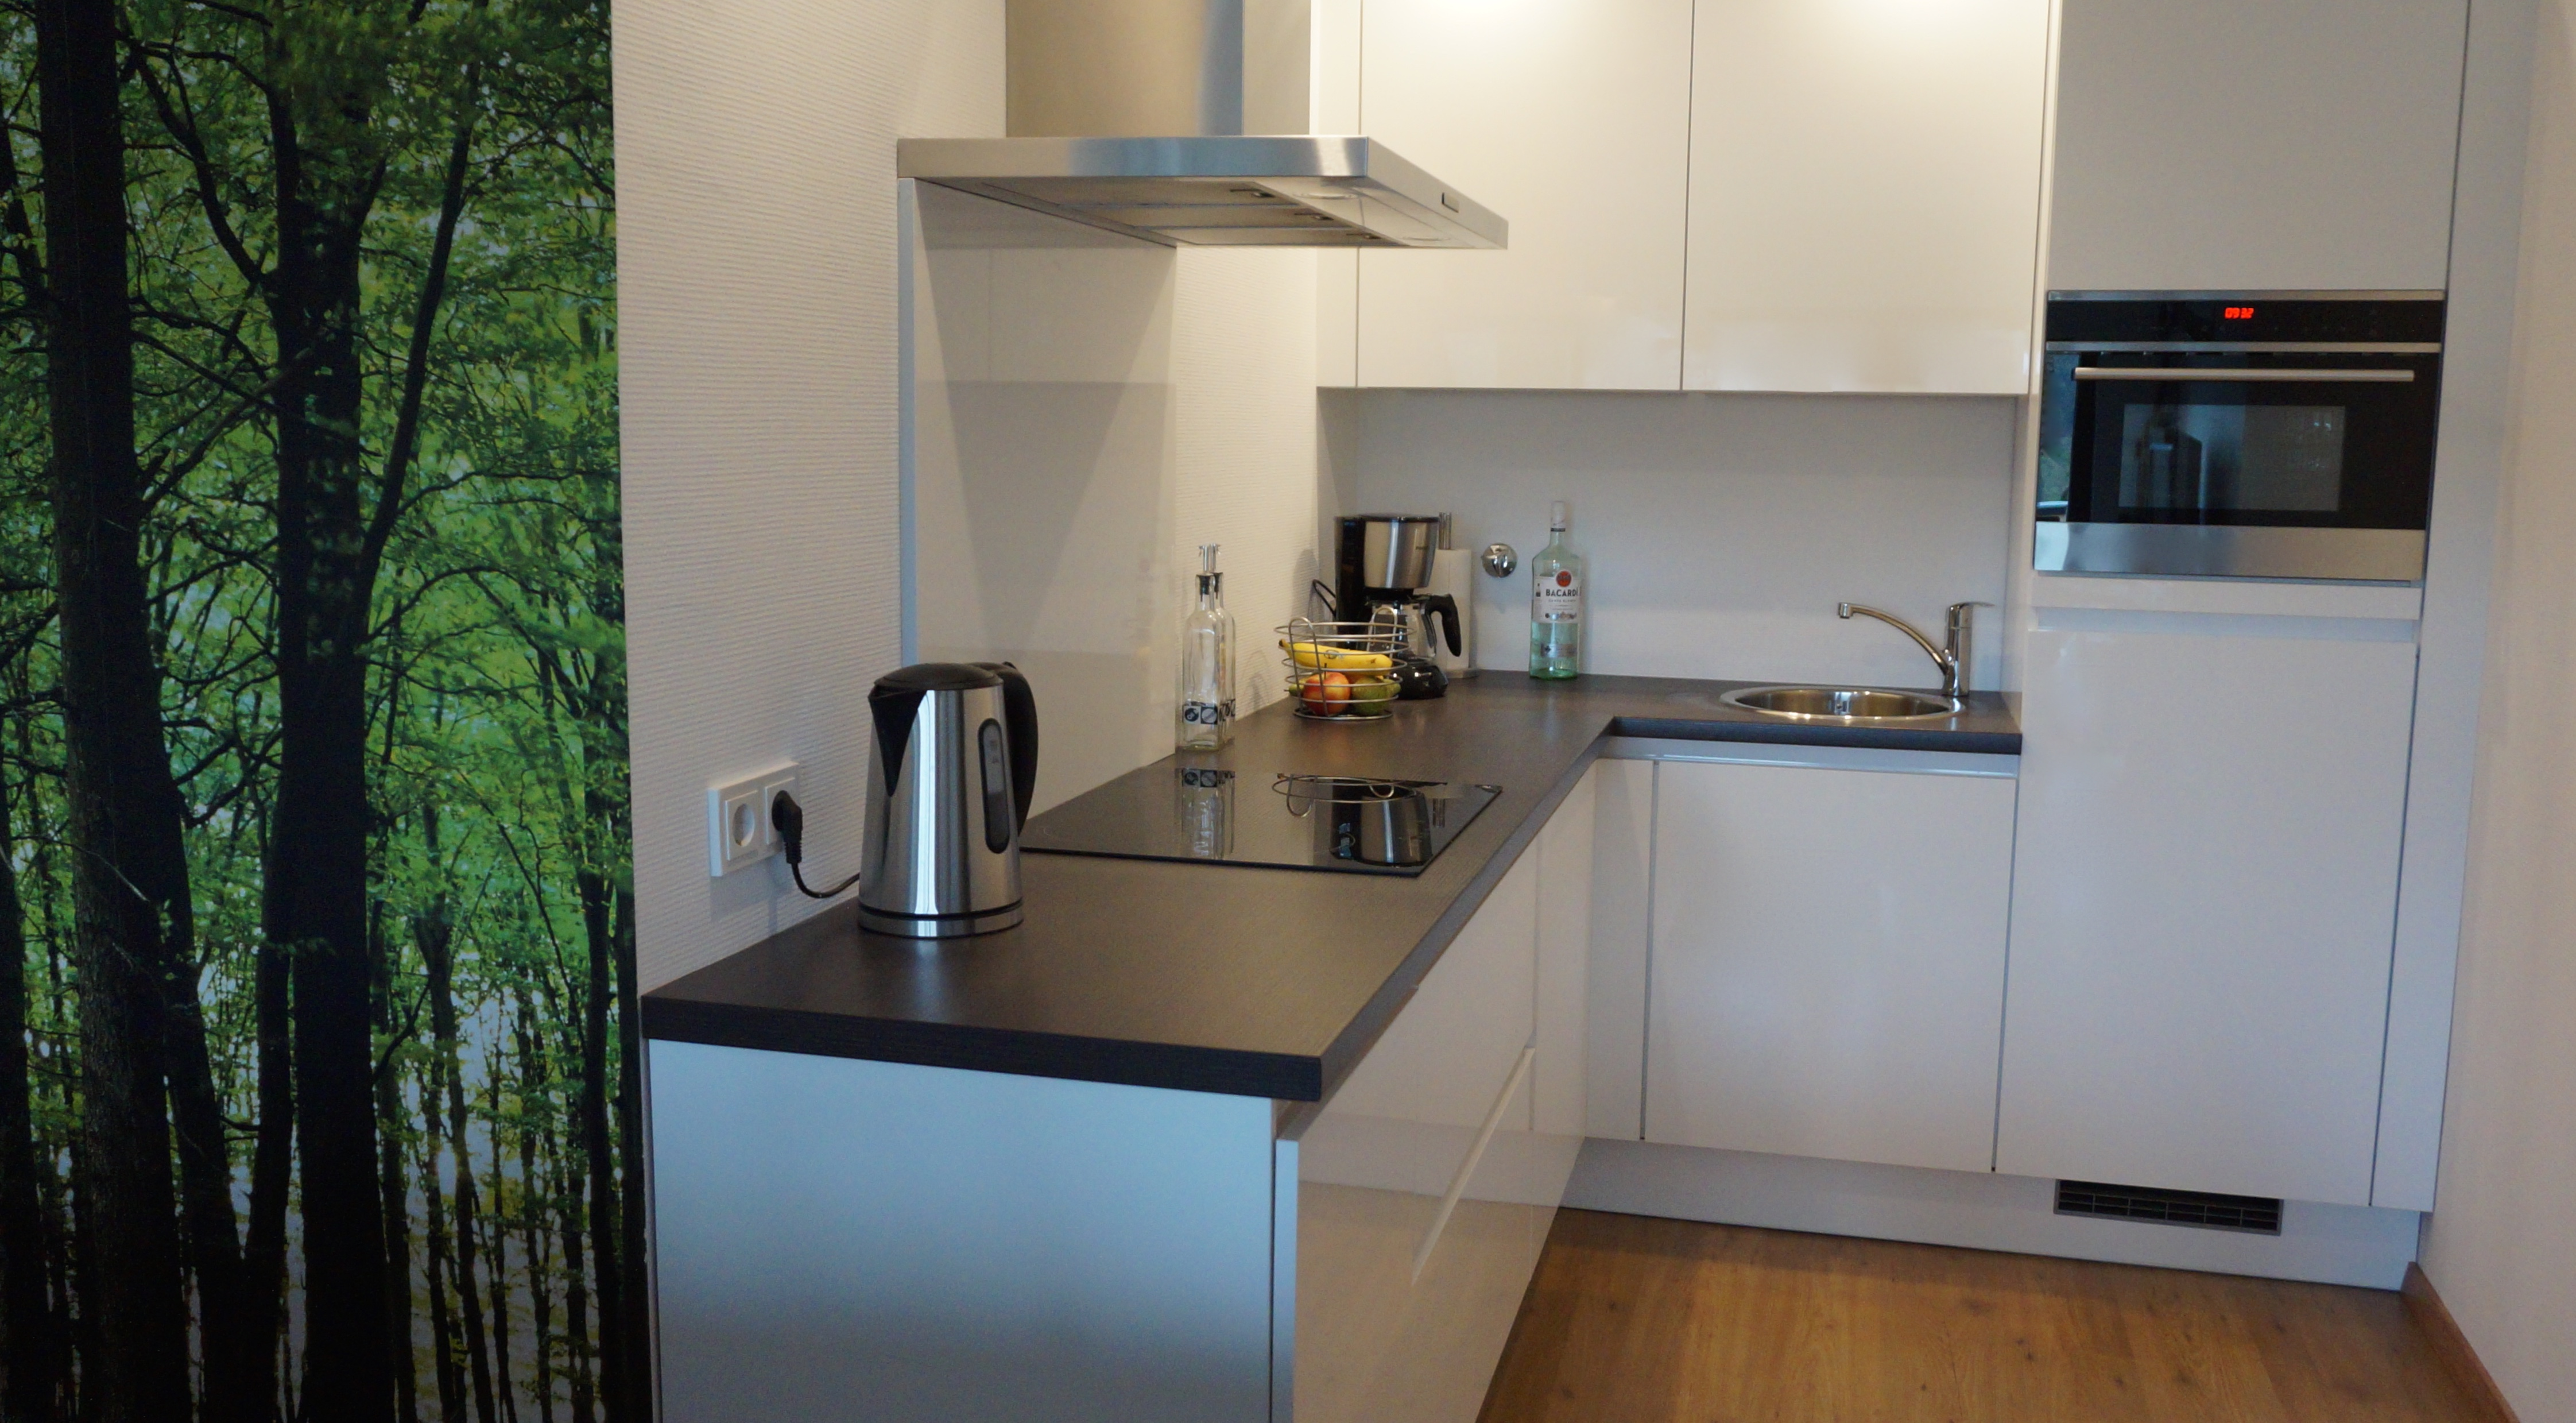 Appartement Familie Willems Winterberg Niedersfeld Apartments For Rent In Winterberg Nordrhein Westfalen Germany